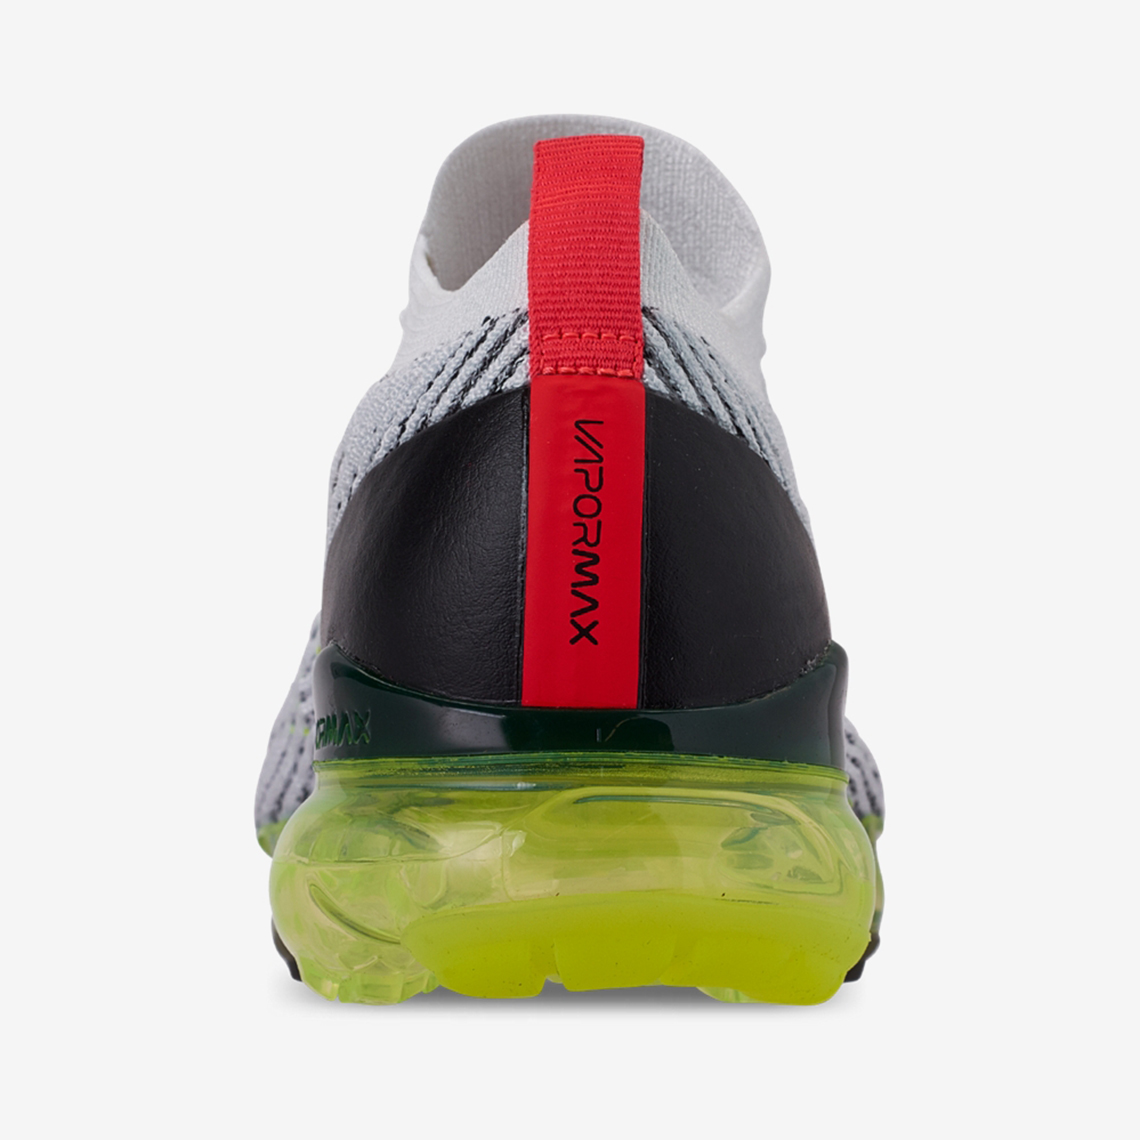 207f56926d Nike Vapormax Flyknit 3 White Volt Crimson AJ6900-100 | SneakerNews.com